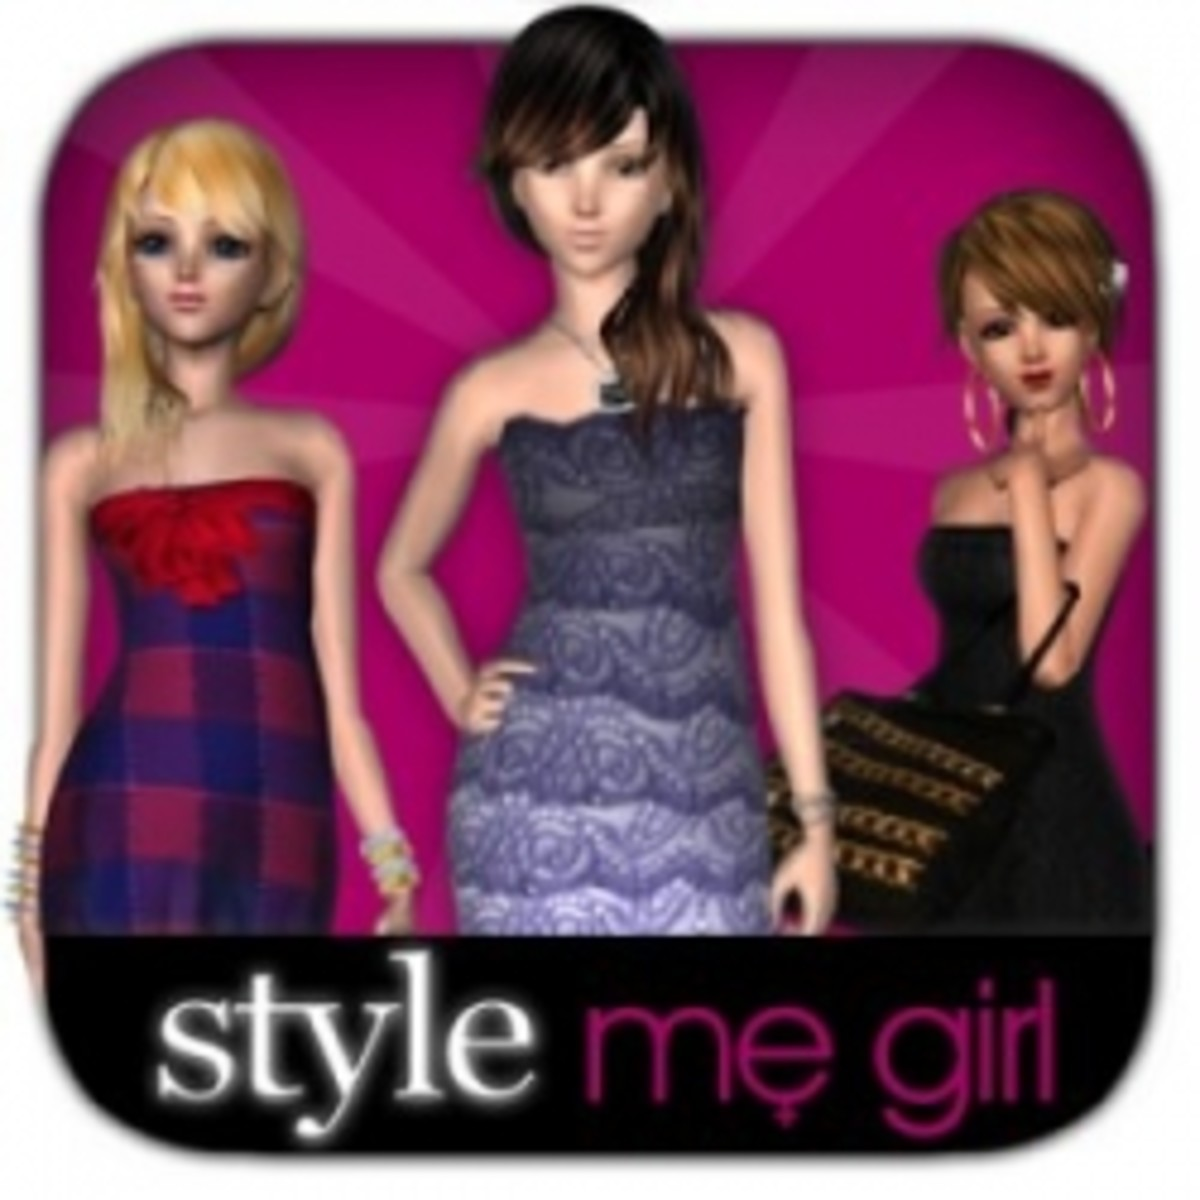 style-me-girl